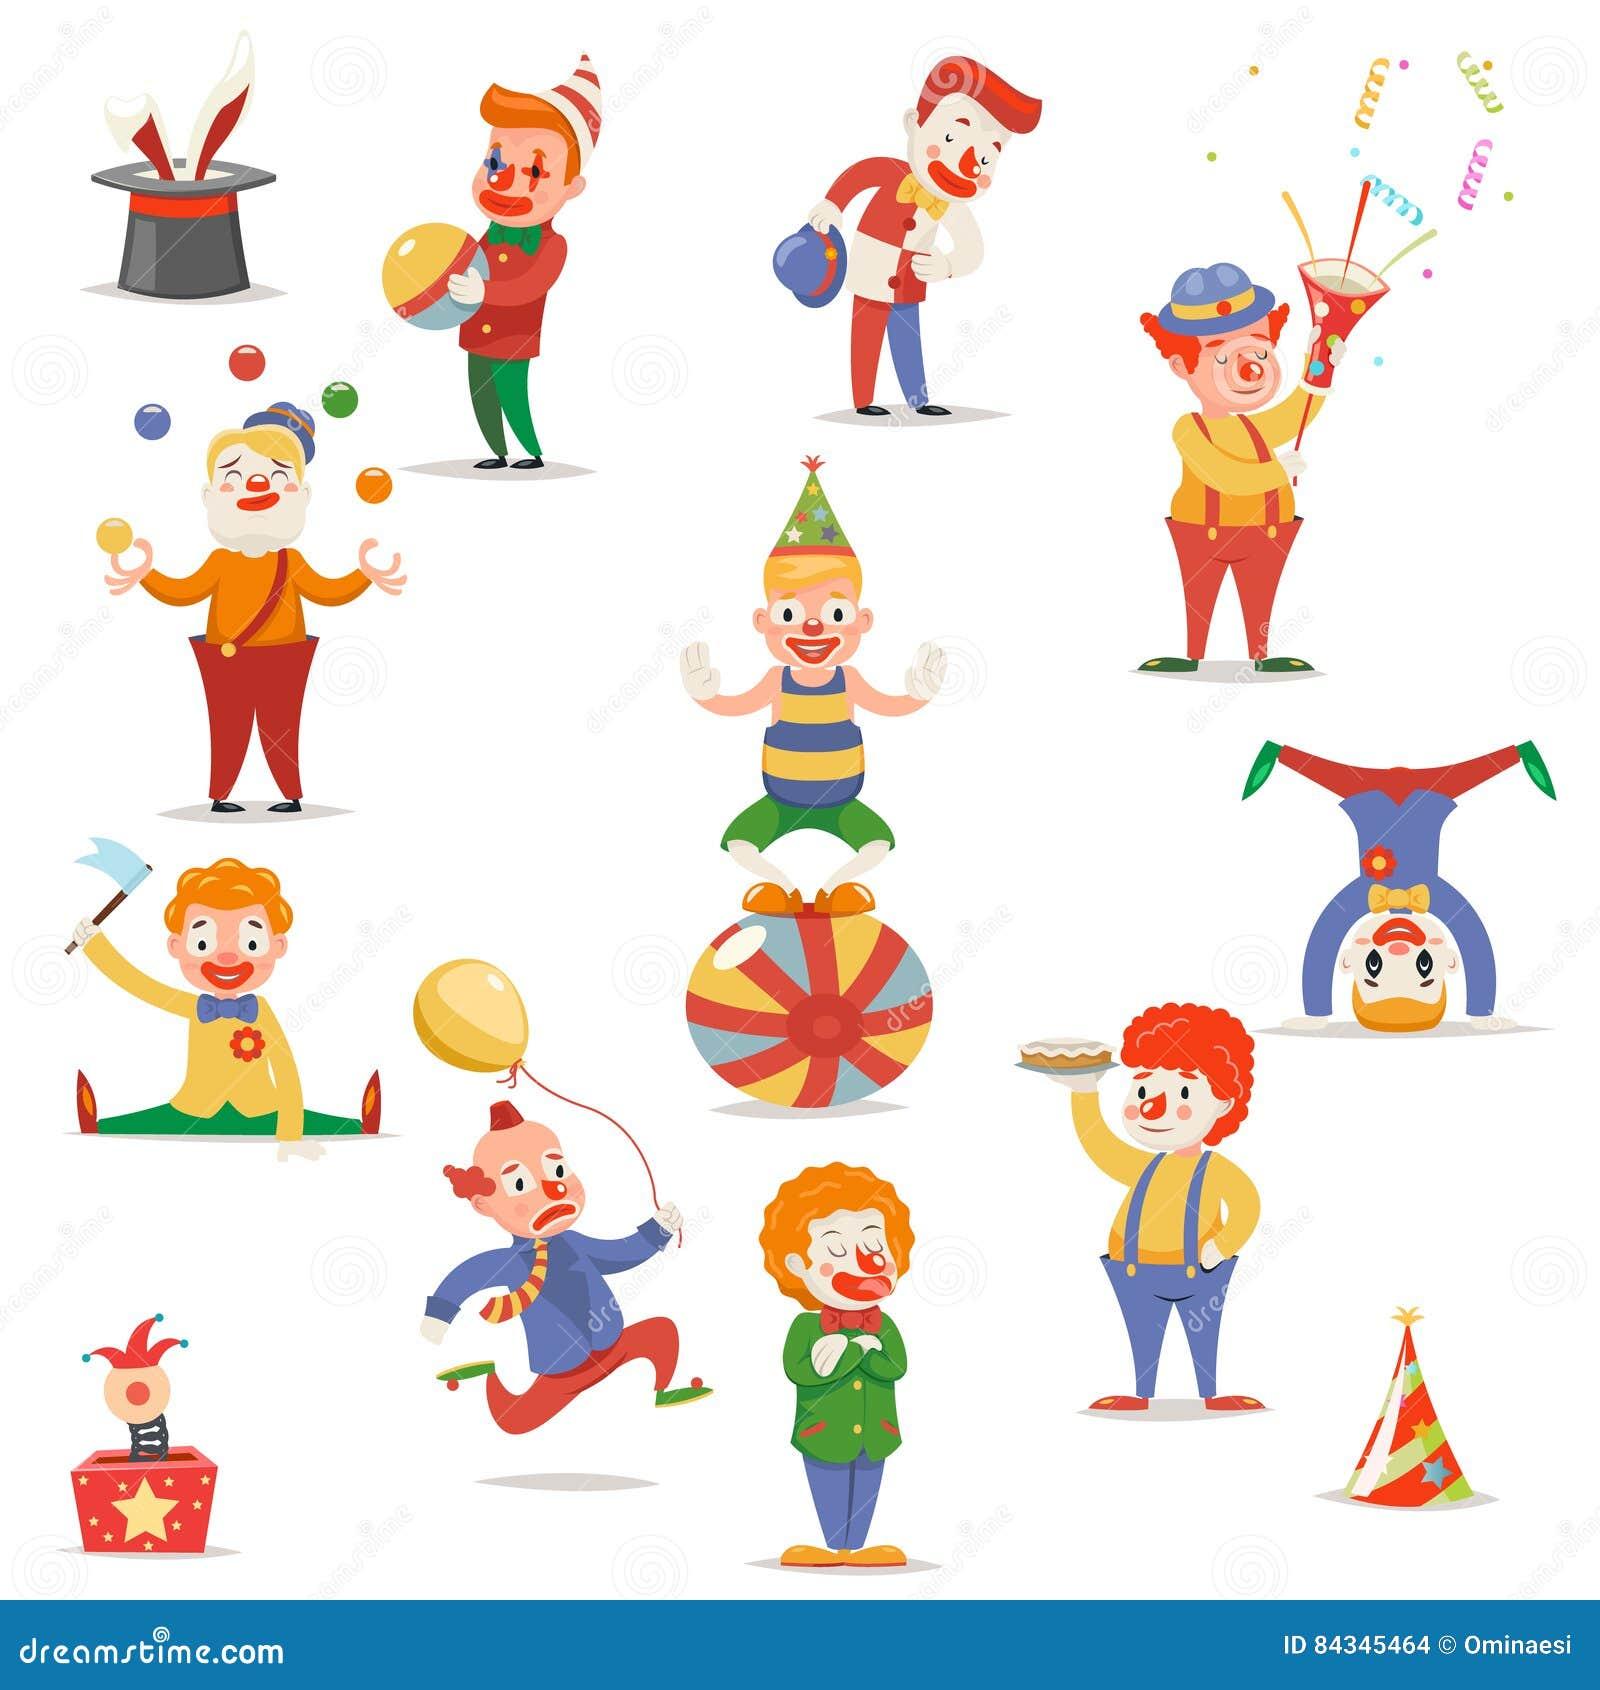 Vector Character Design Illustrator : Funny cartoon character vector illustration